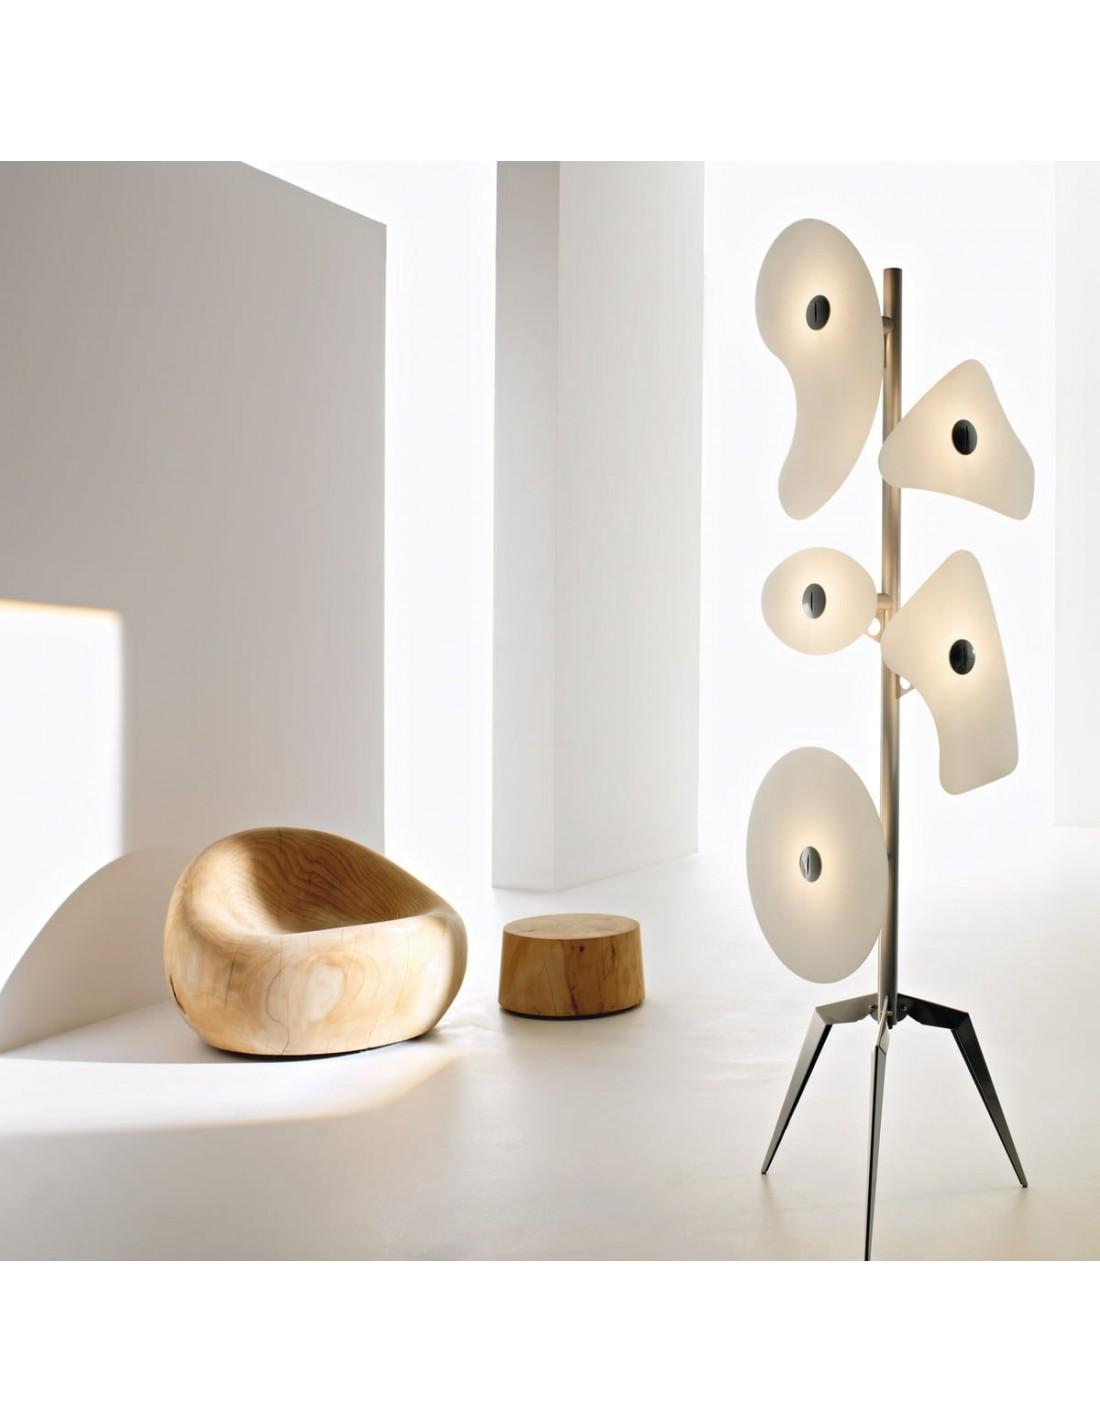 Lampadaire orbital blanc Foscarini - Valente Design